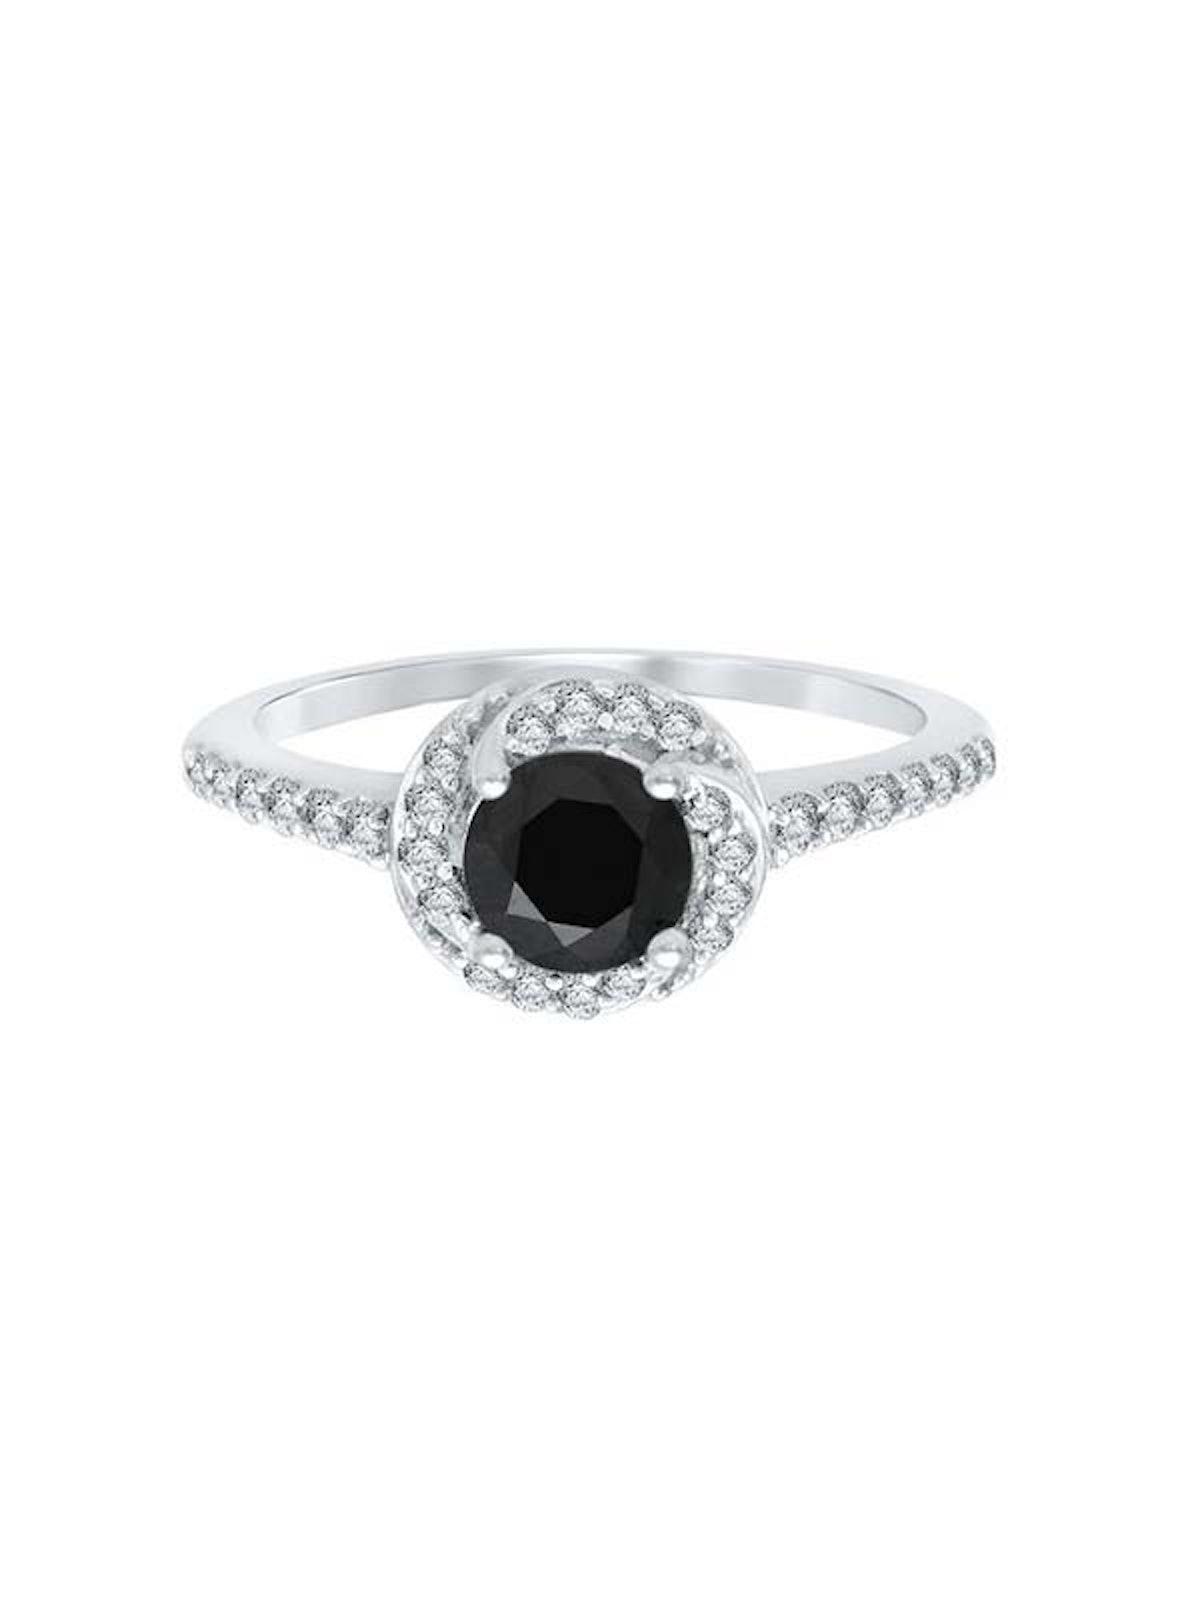 Black And White Diamond Halo Engagement Ring